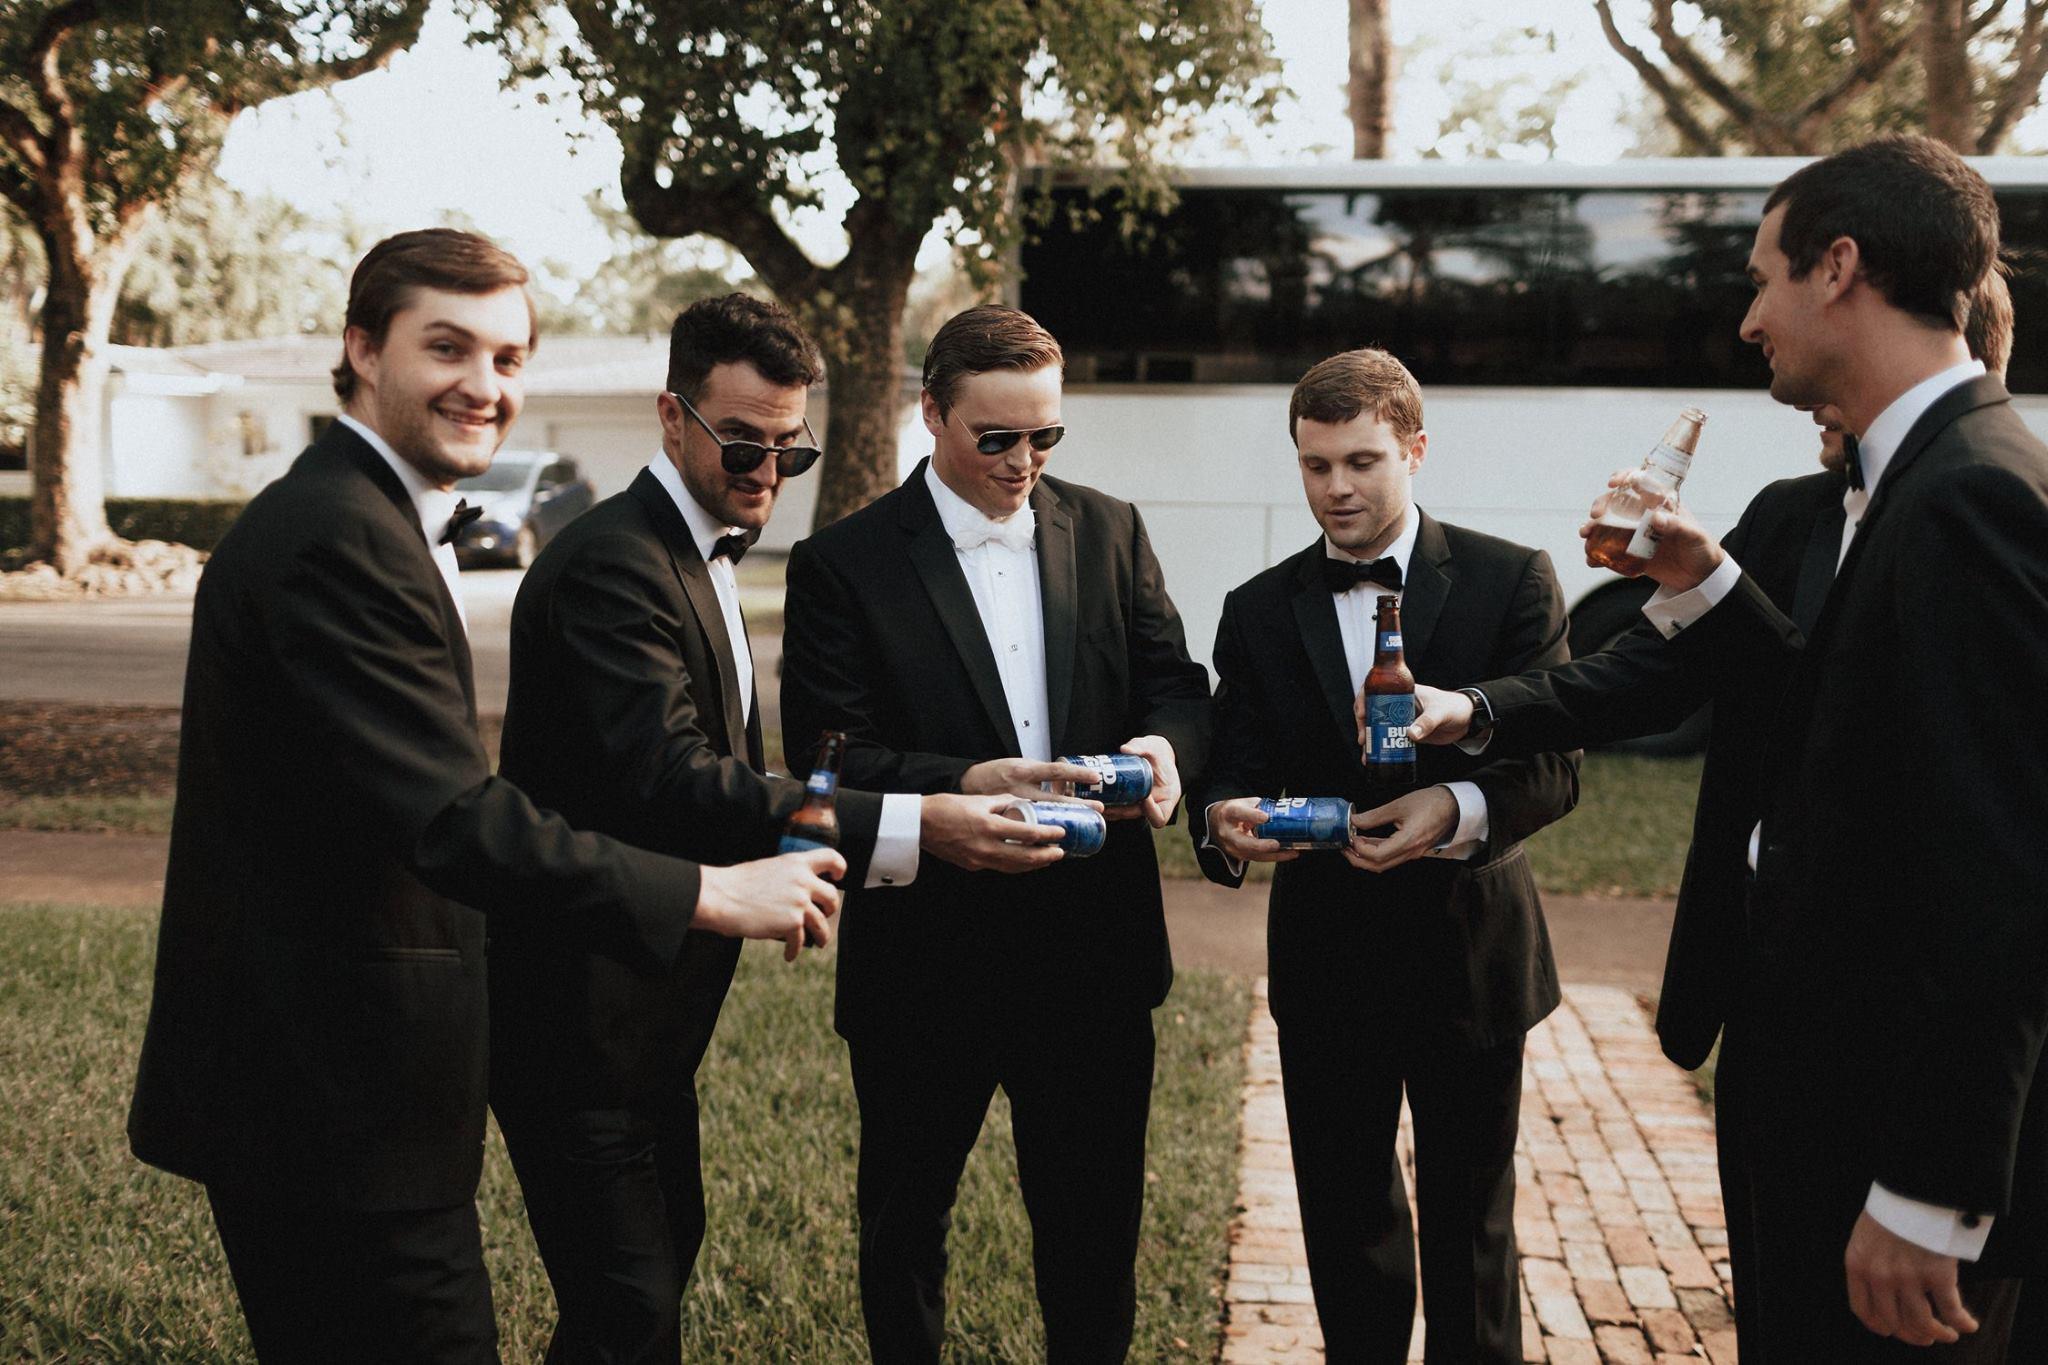 Catering Luxury Destination Wedding in Miami 24.jpg